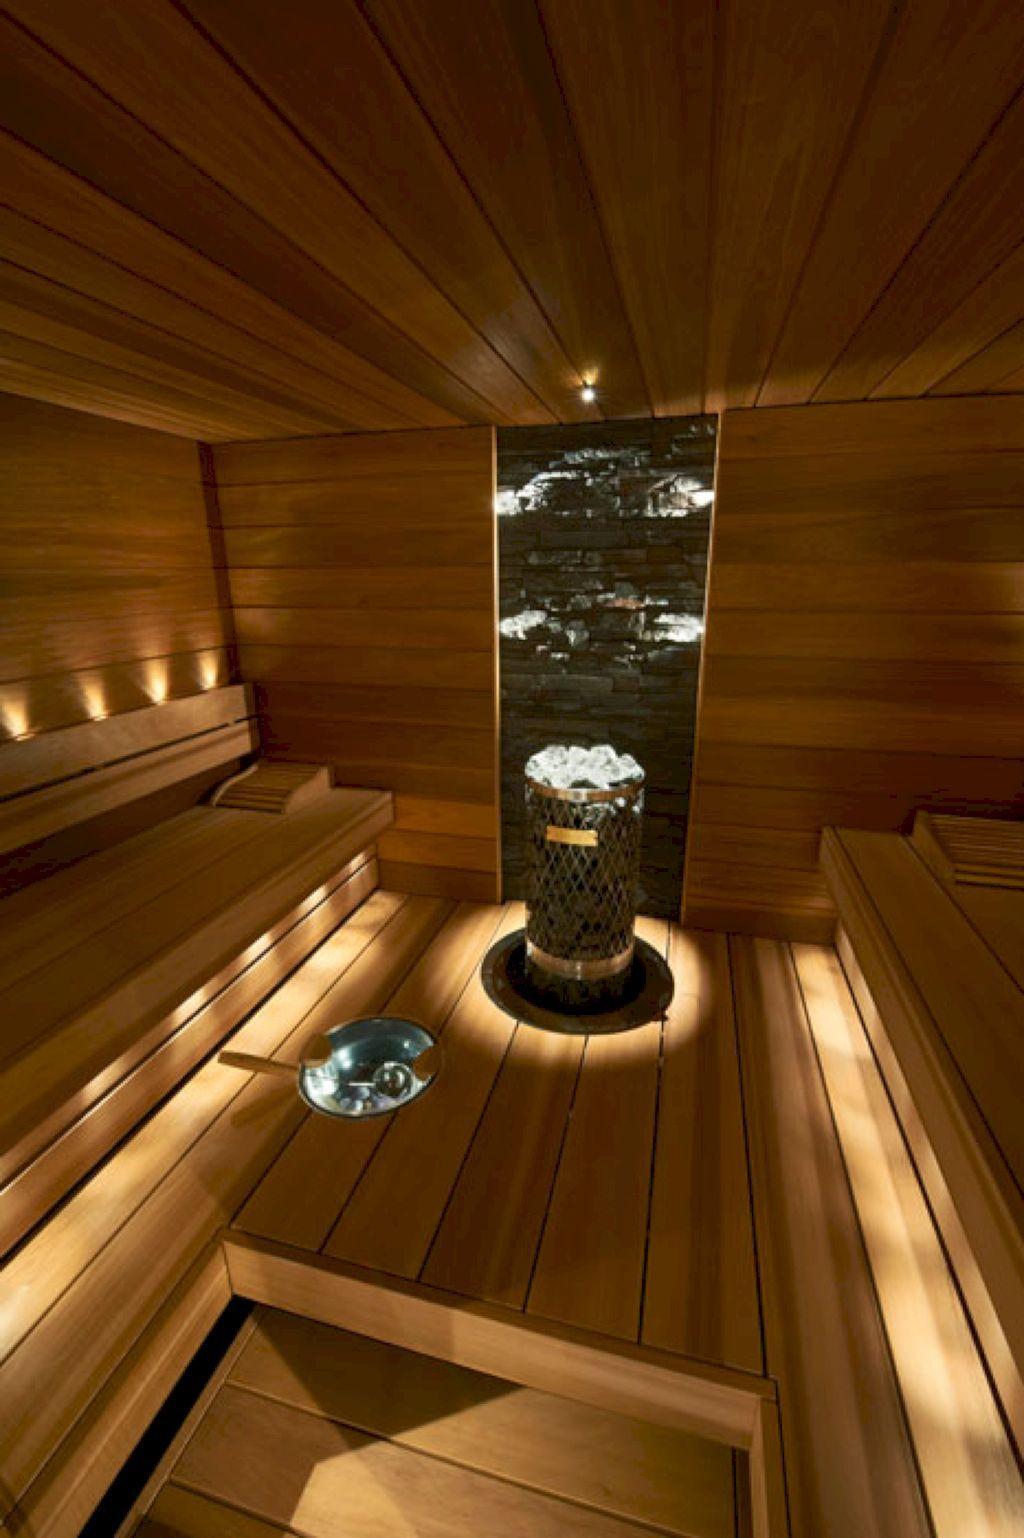 sauna design ideas on home telephone ideas home jacuzzi ideas sauna building ideas - Sauna Design Ideas